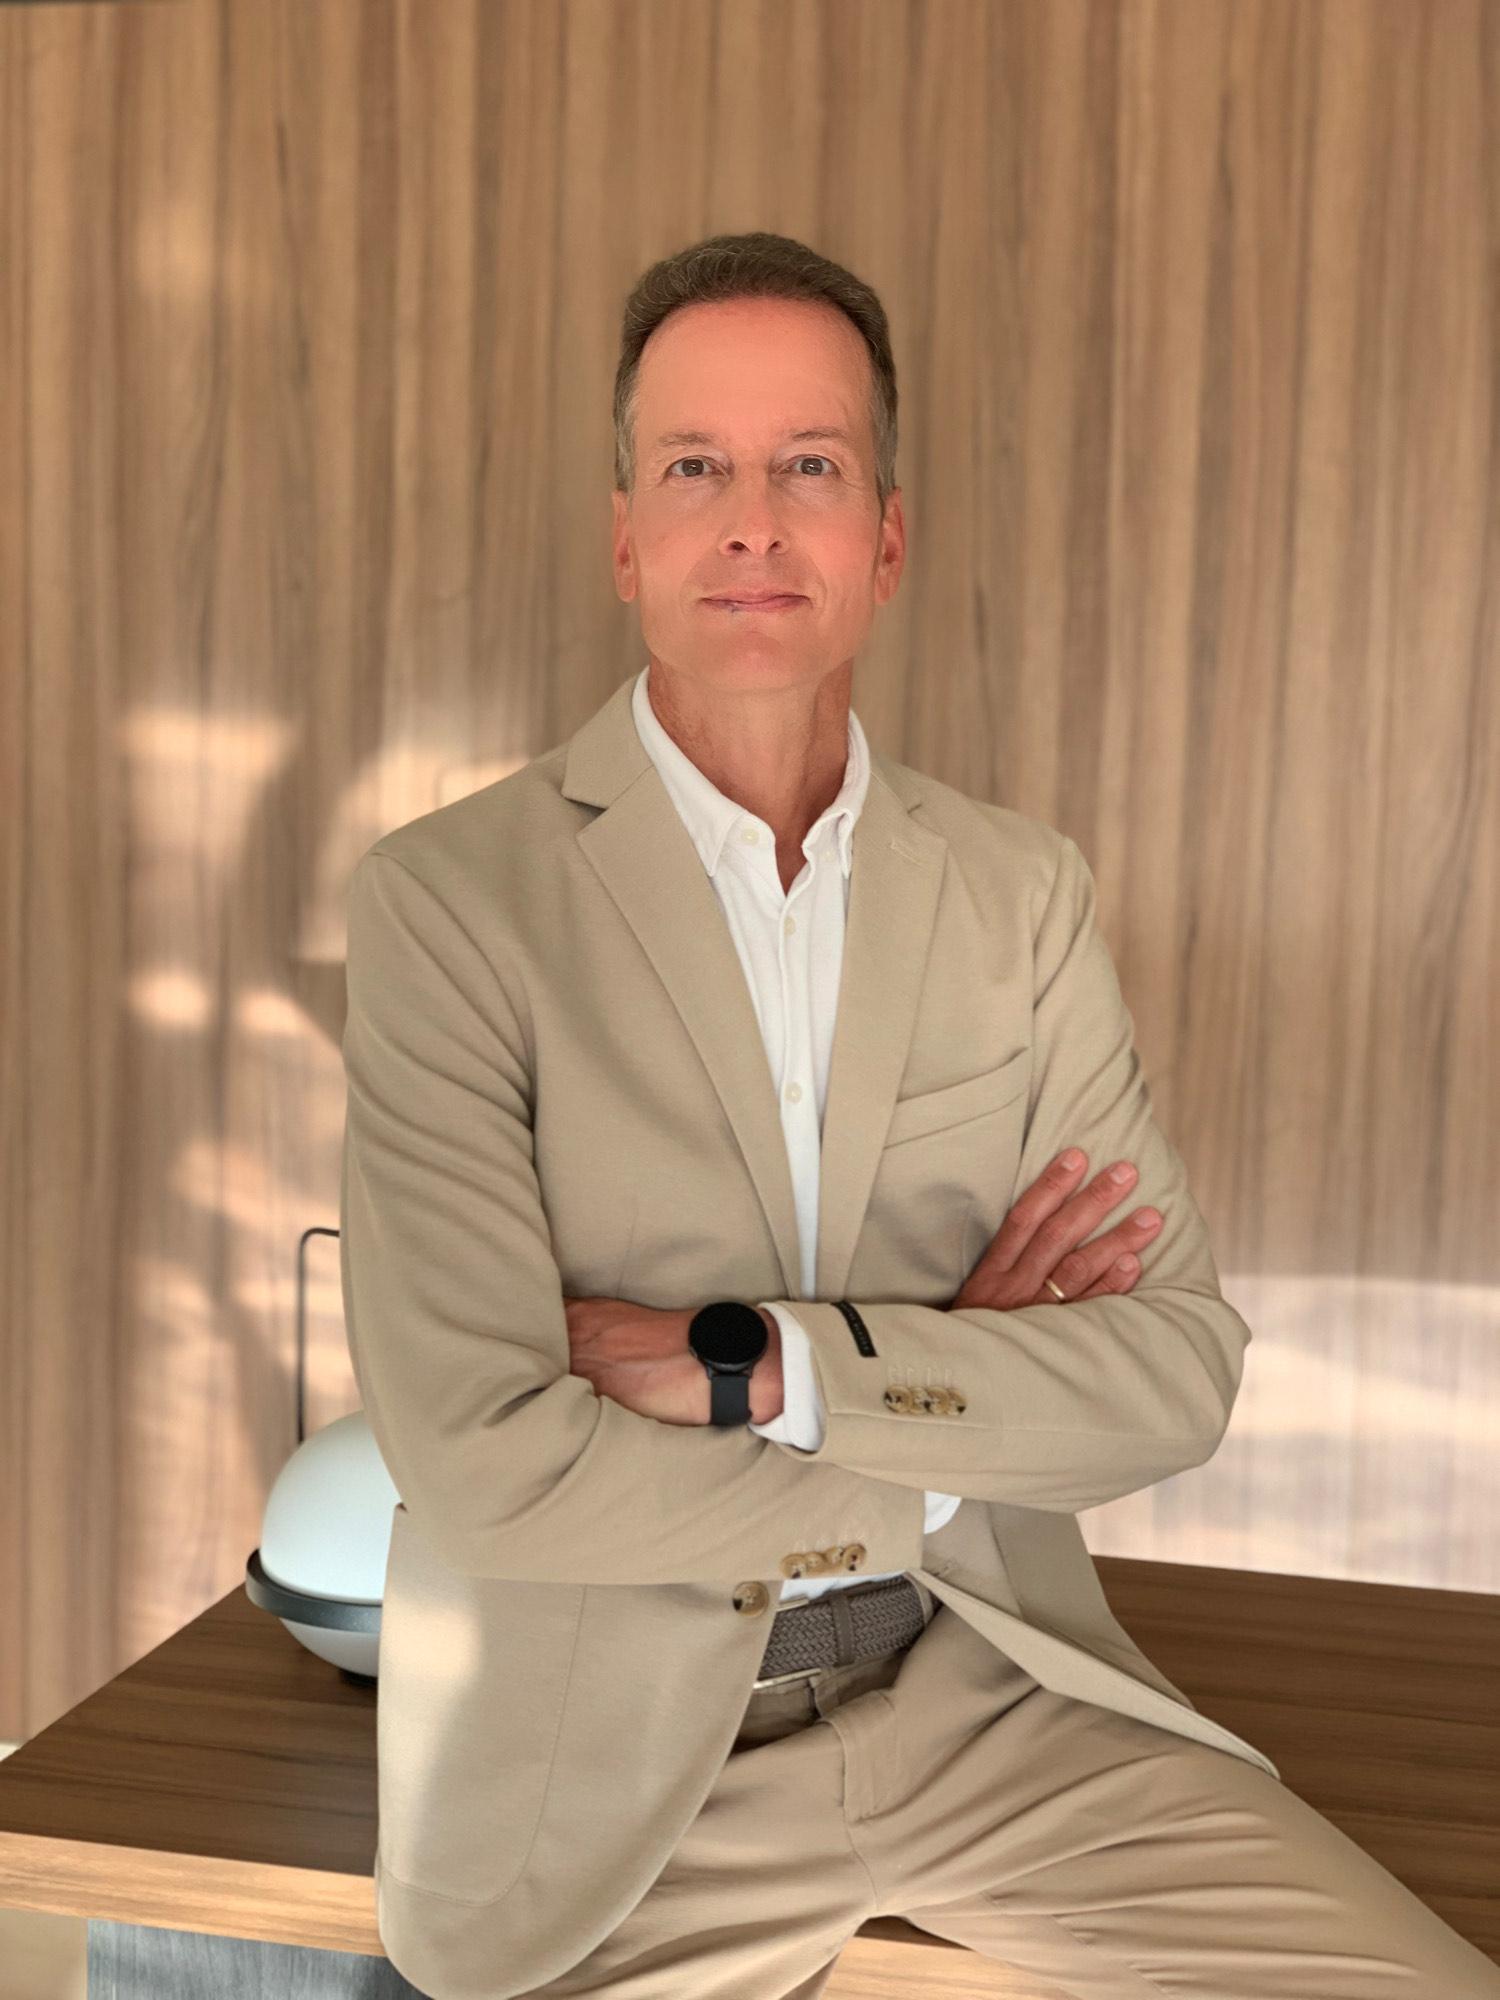 Rechtsanwalt Andreas Lauterjung